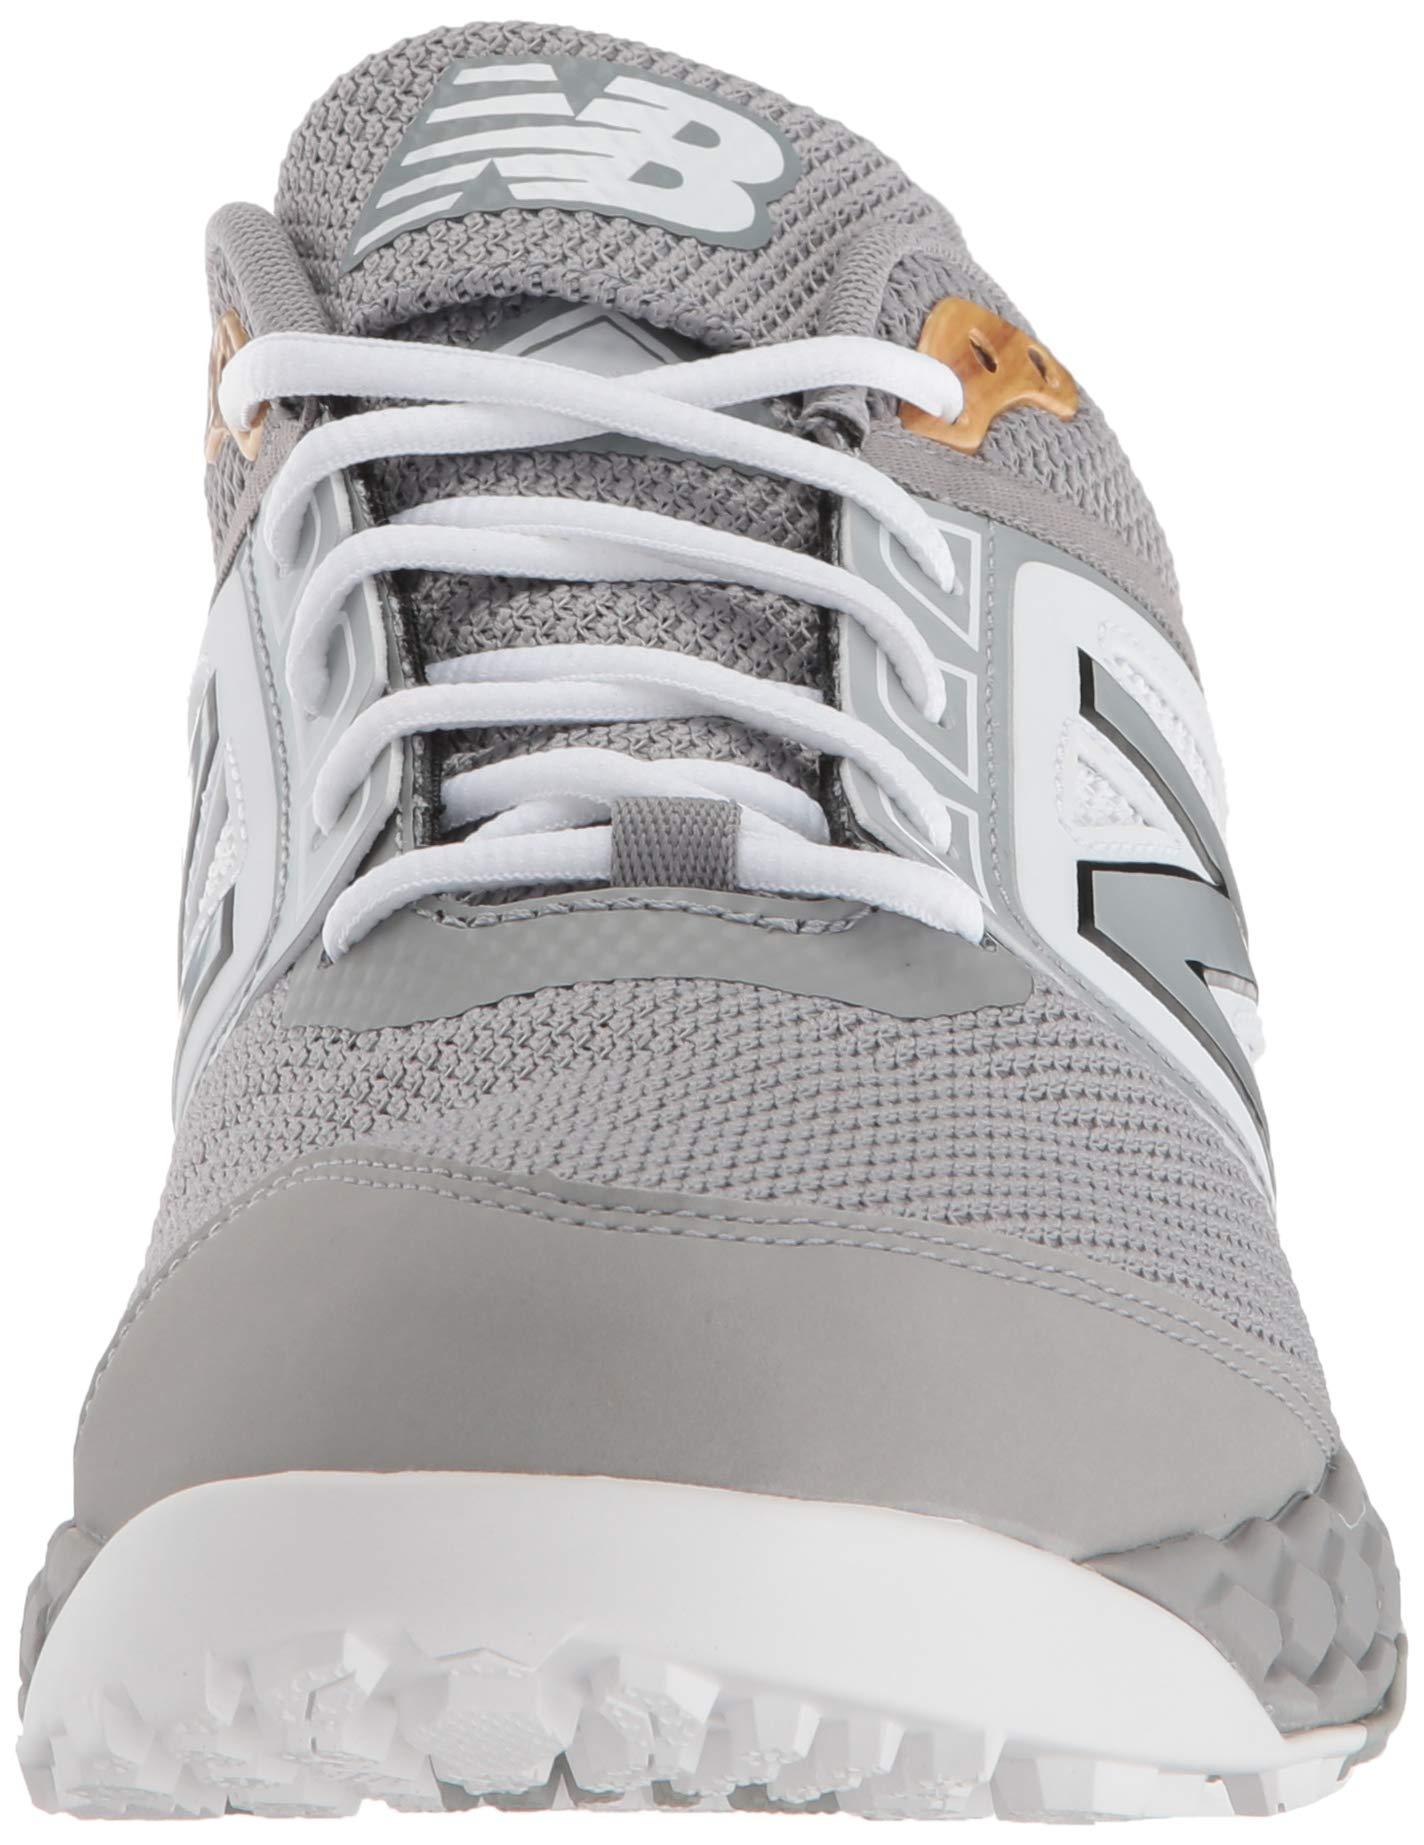 New Balance Men's 3000v4 Turf Baseball Shoe, Grey/White, 5 D US by New Balance (Image #4)